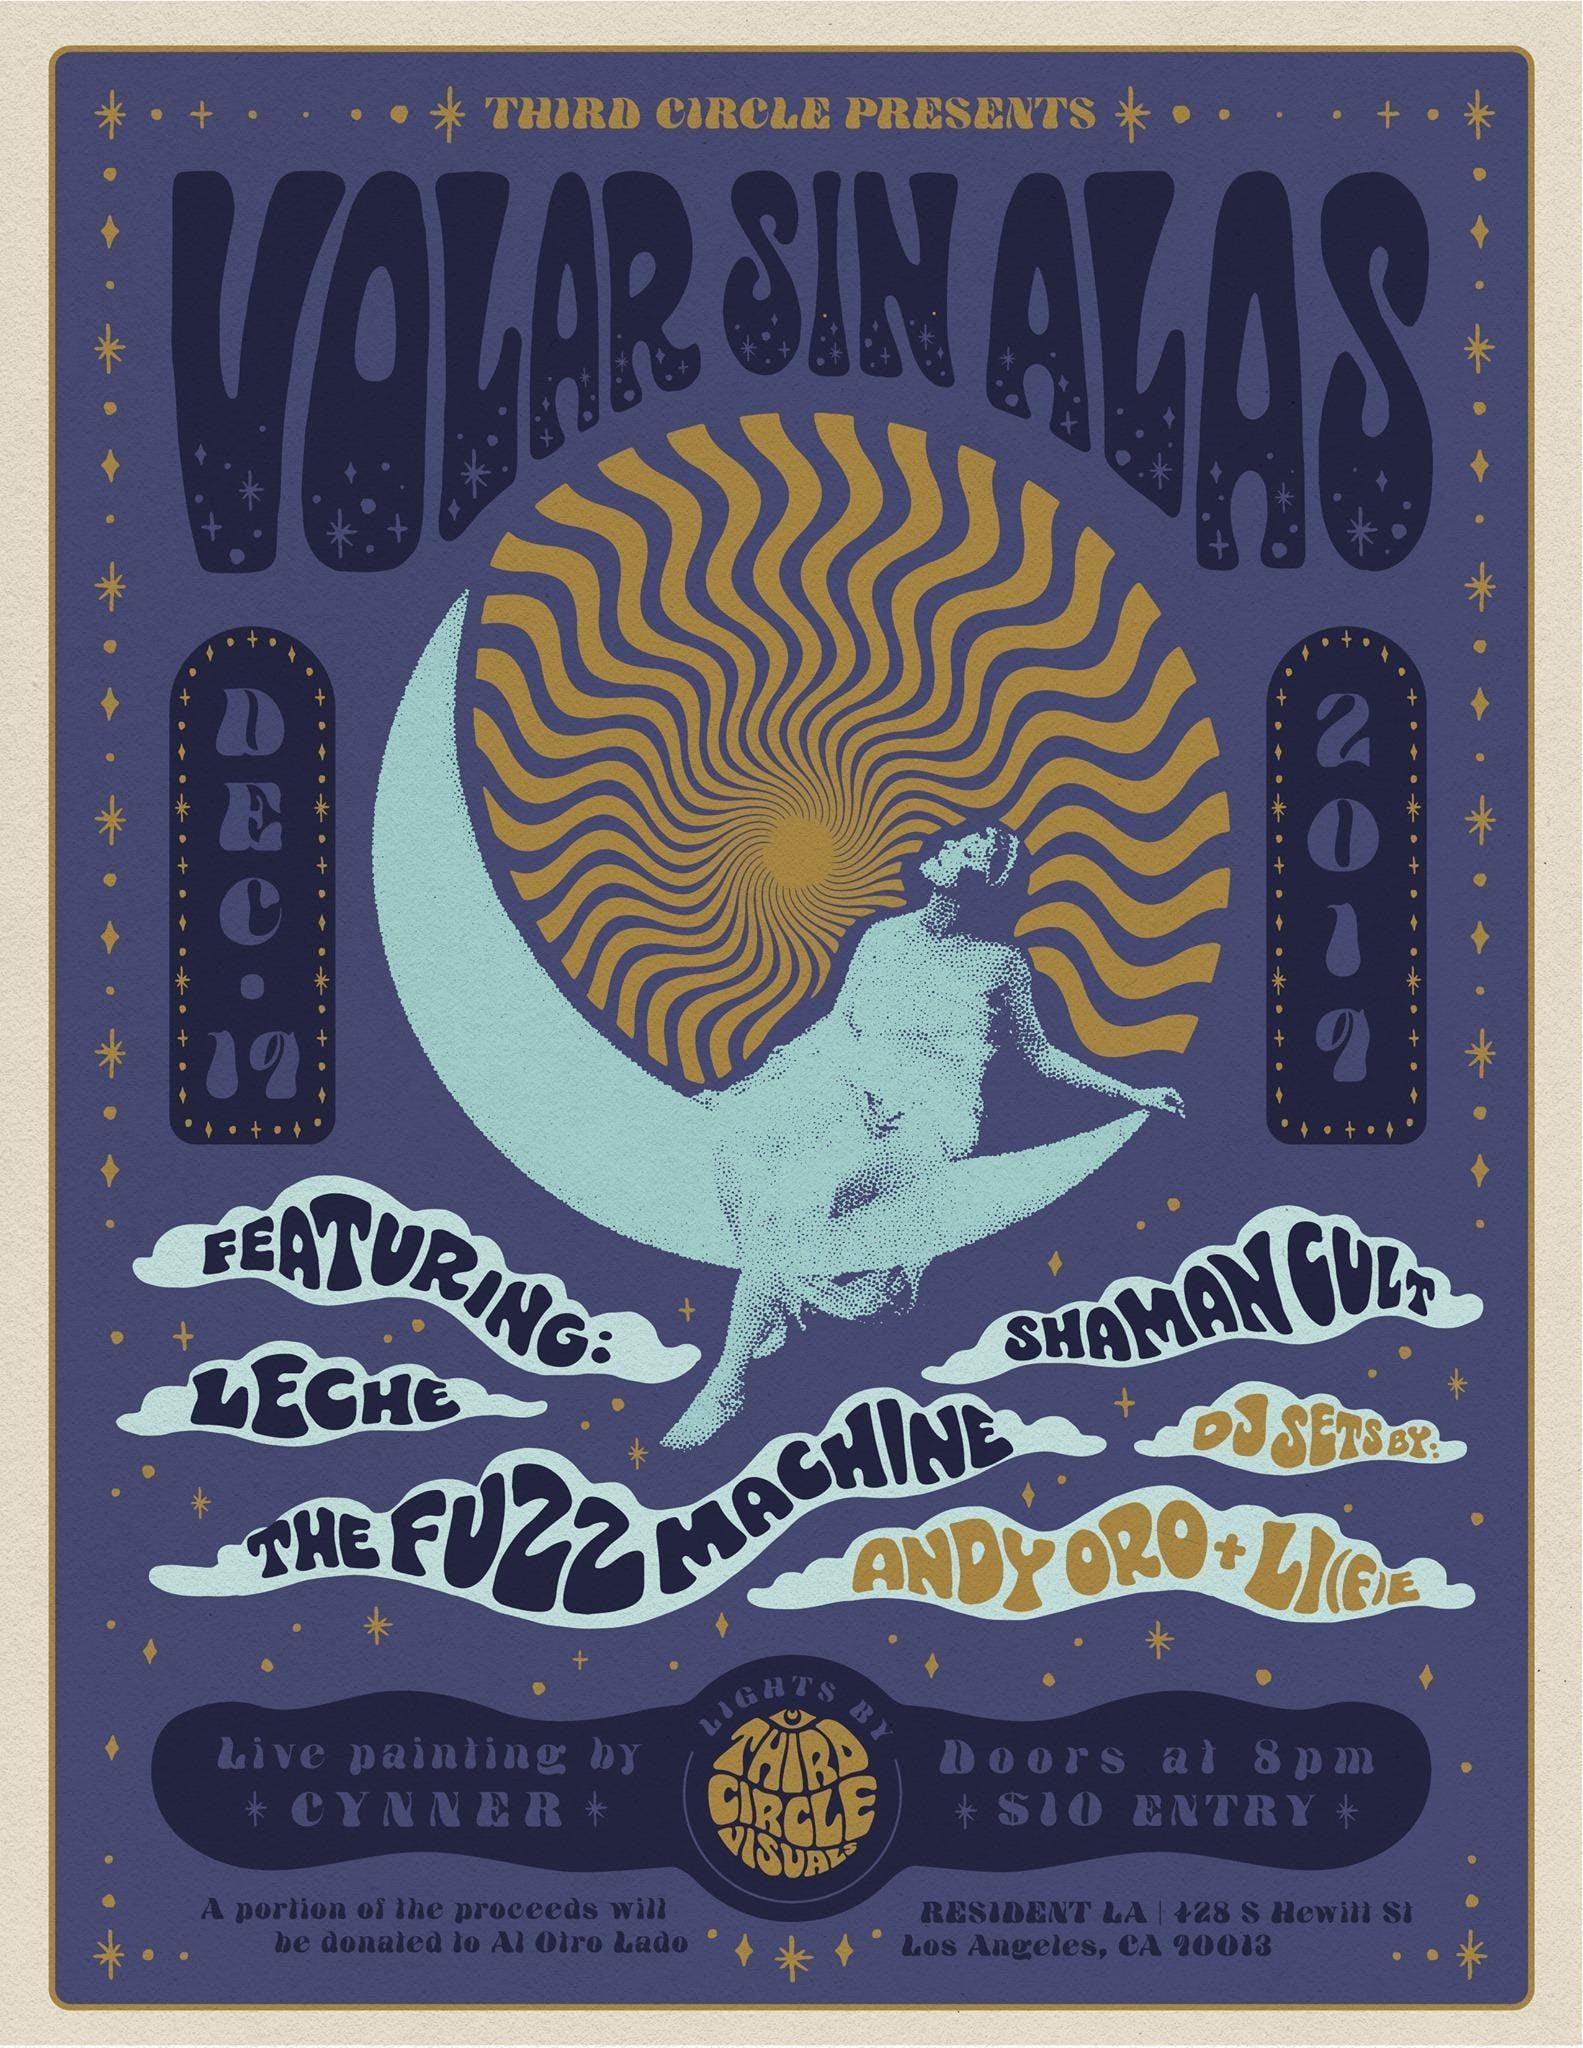 Volar Sin Alas feat. Leche, The Fuzz Machine and Shaman Cult